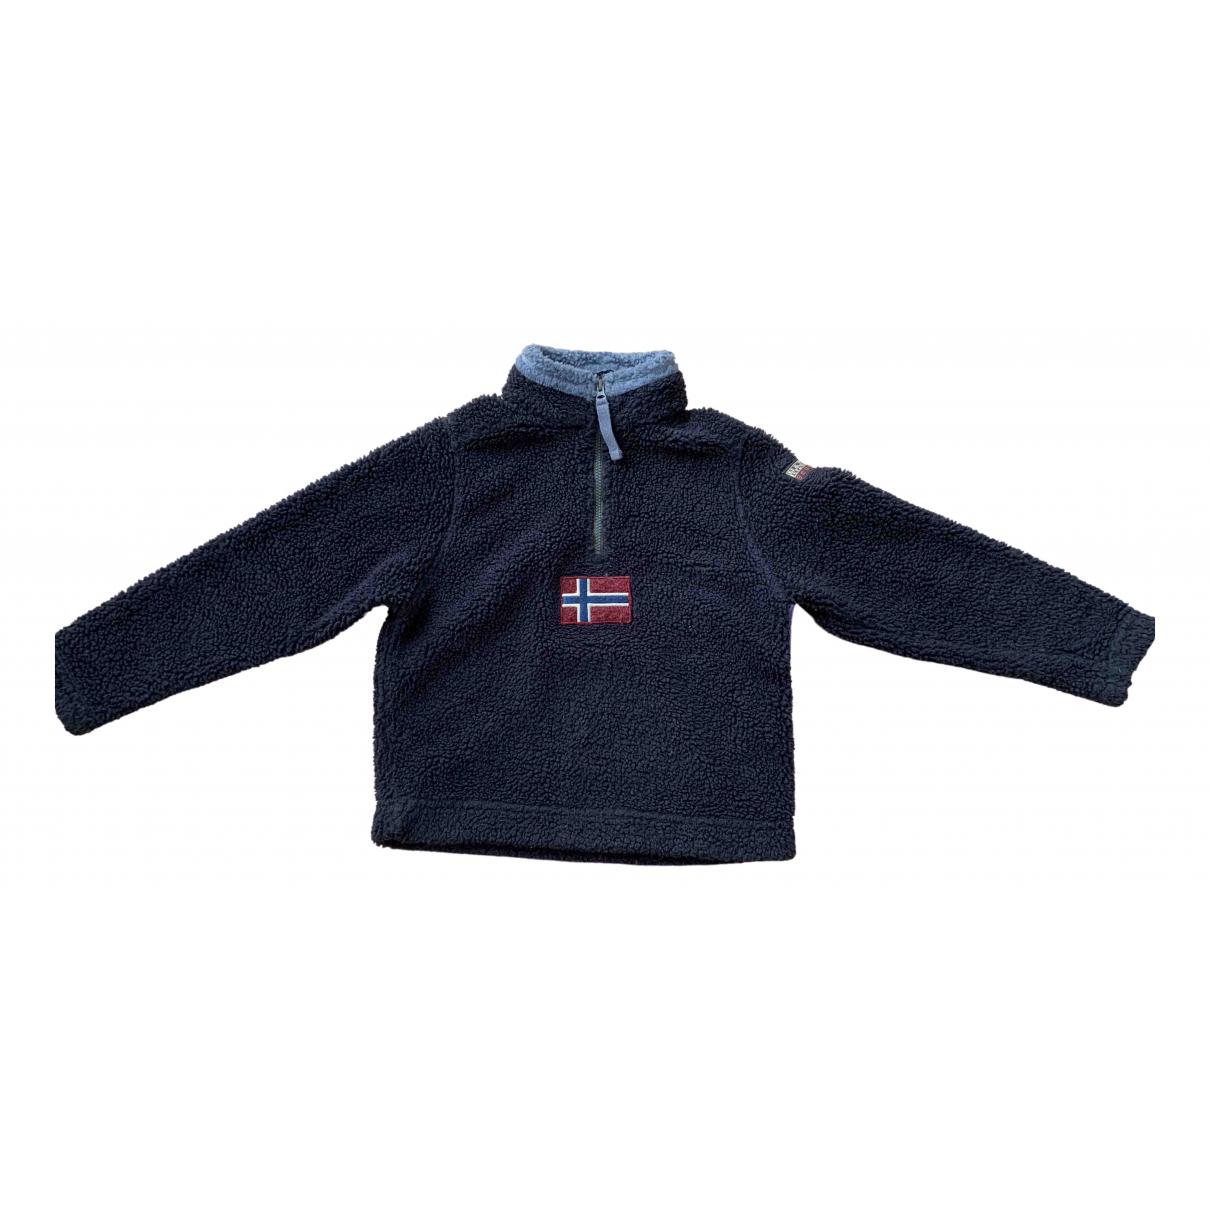 Napapijri \N Blue jacket & coat for Kids 4 years - until 40 inches UK